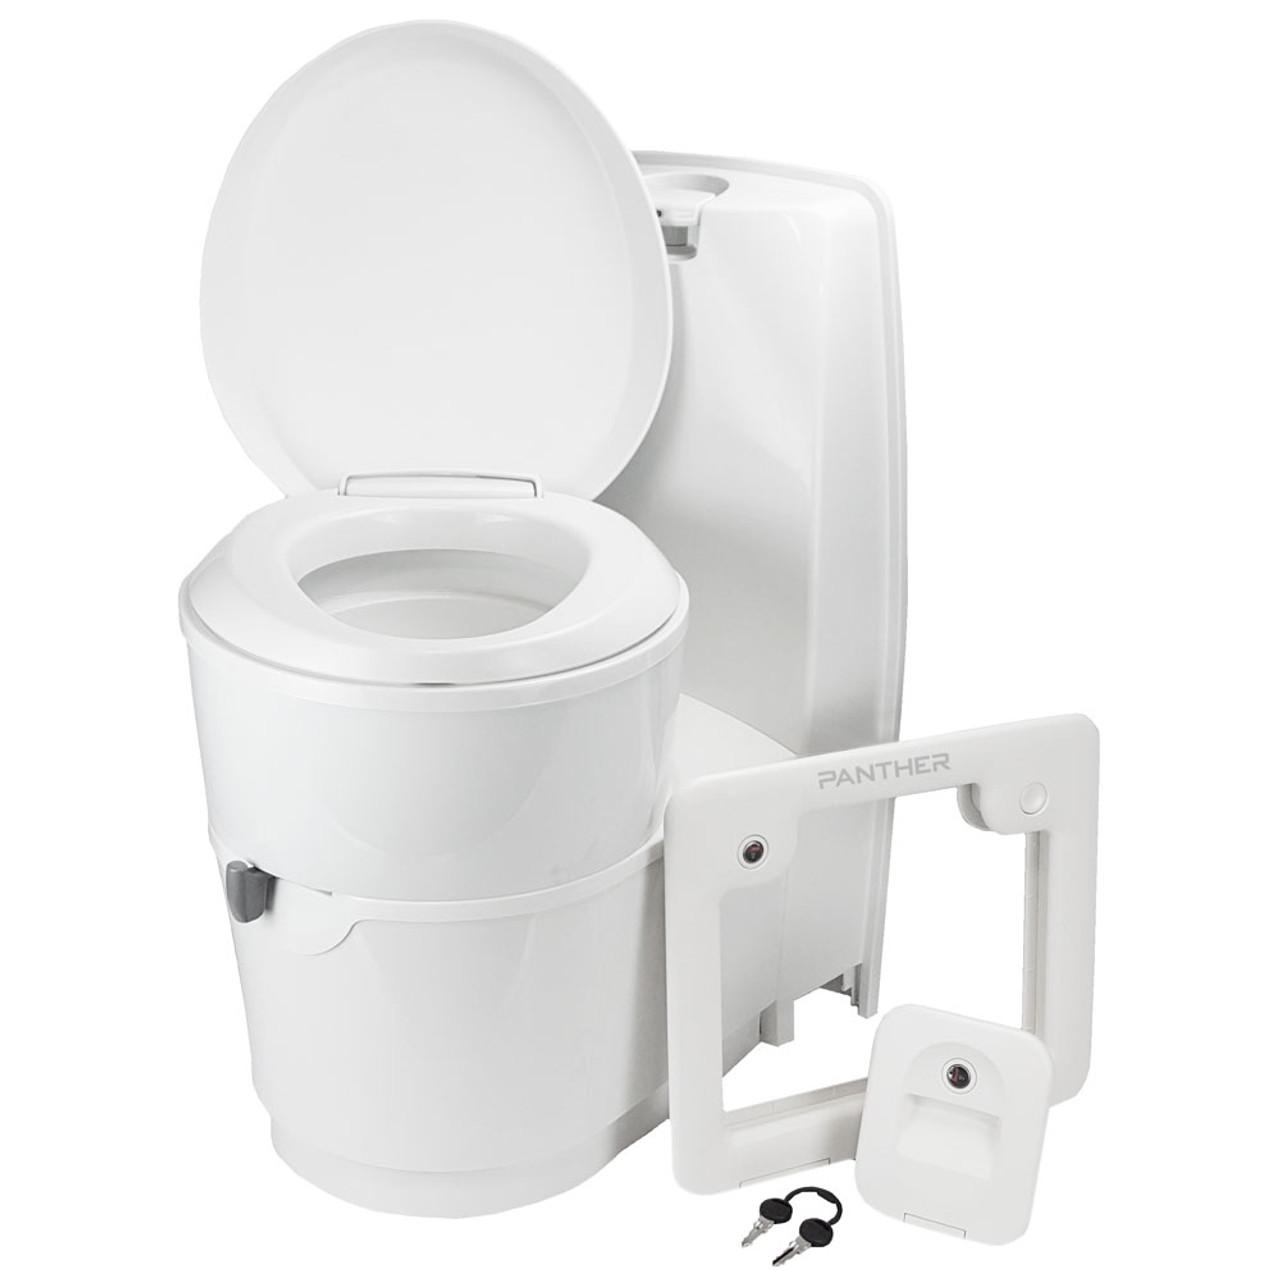 thetford c250 toilet wiring diagram 2003 international 4300 a c spare parts c260 cassette holding